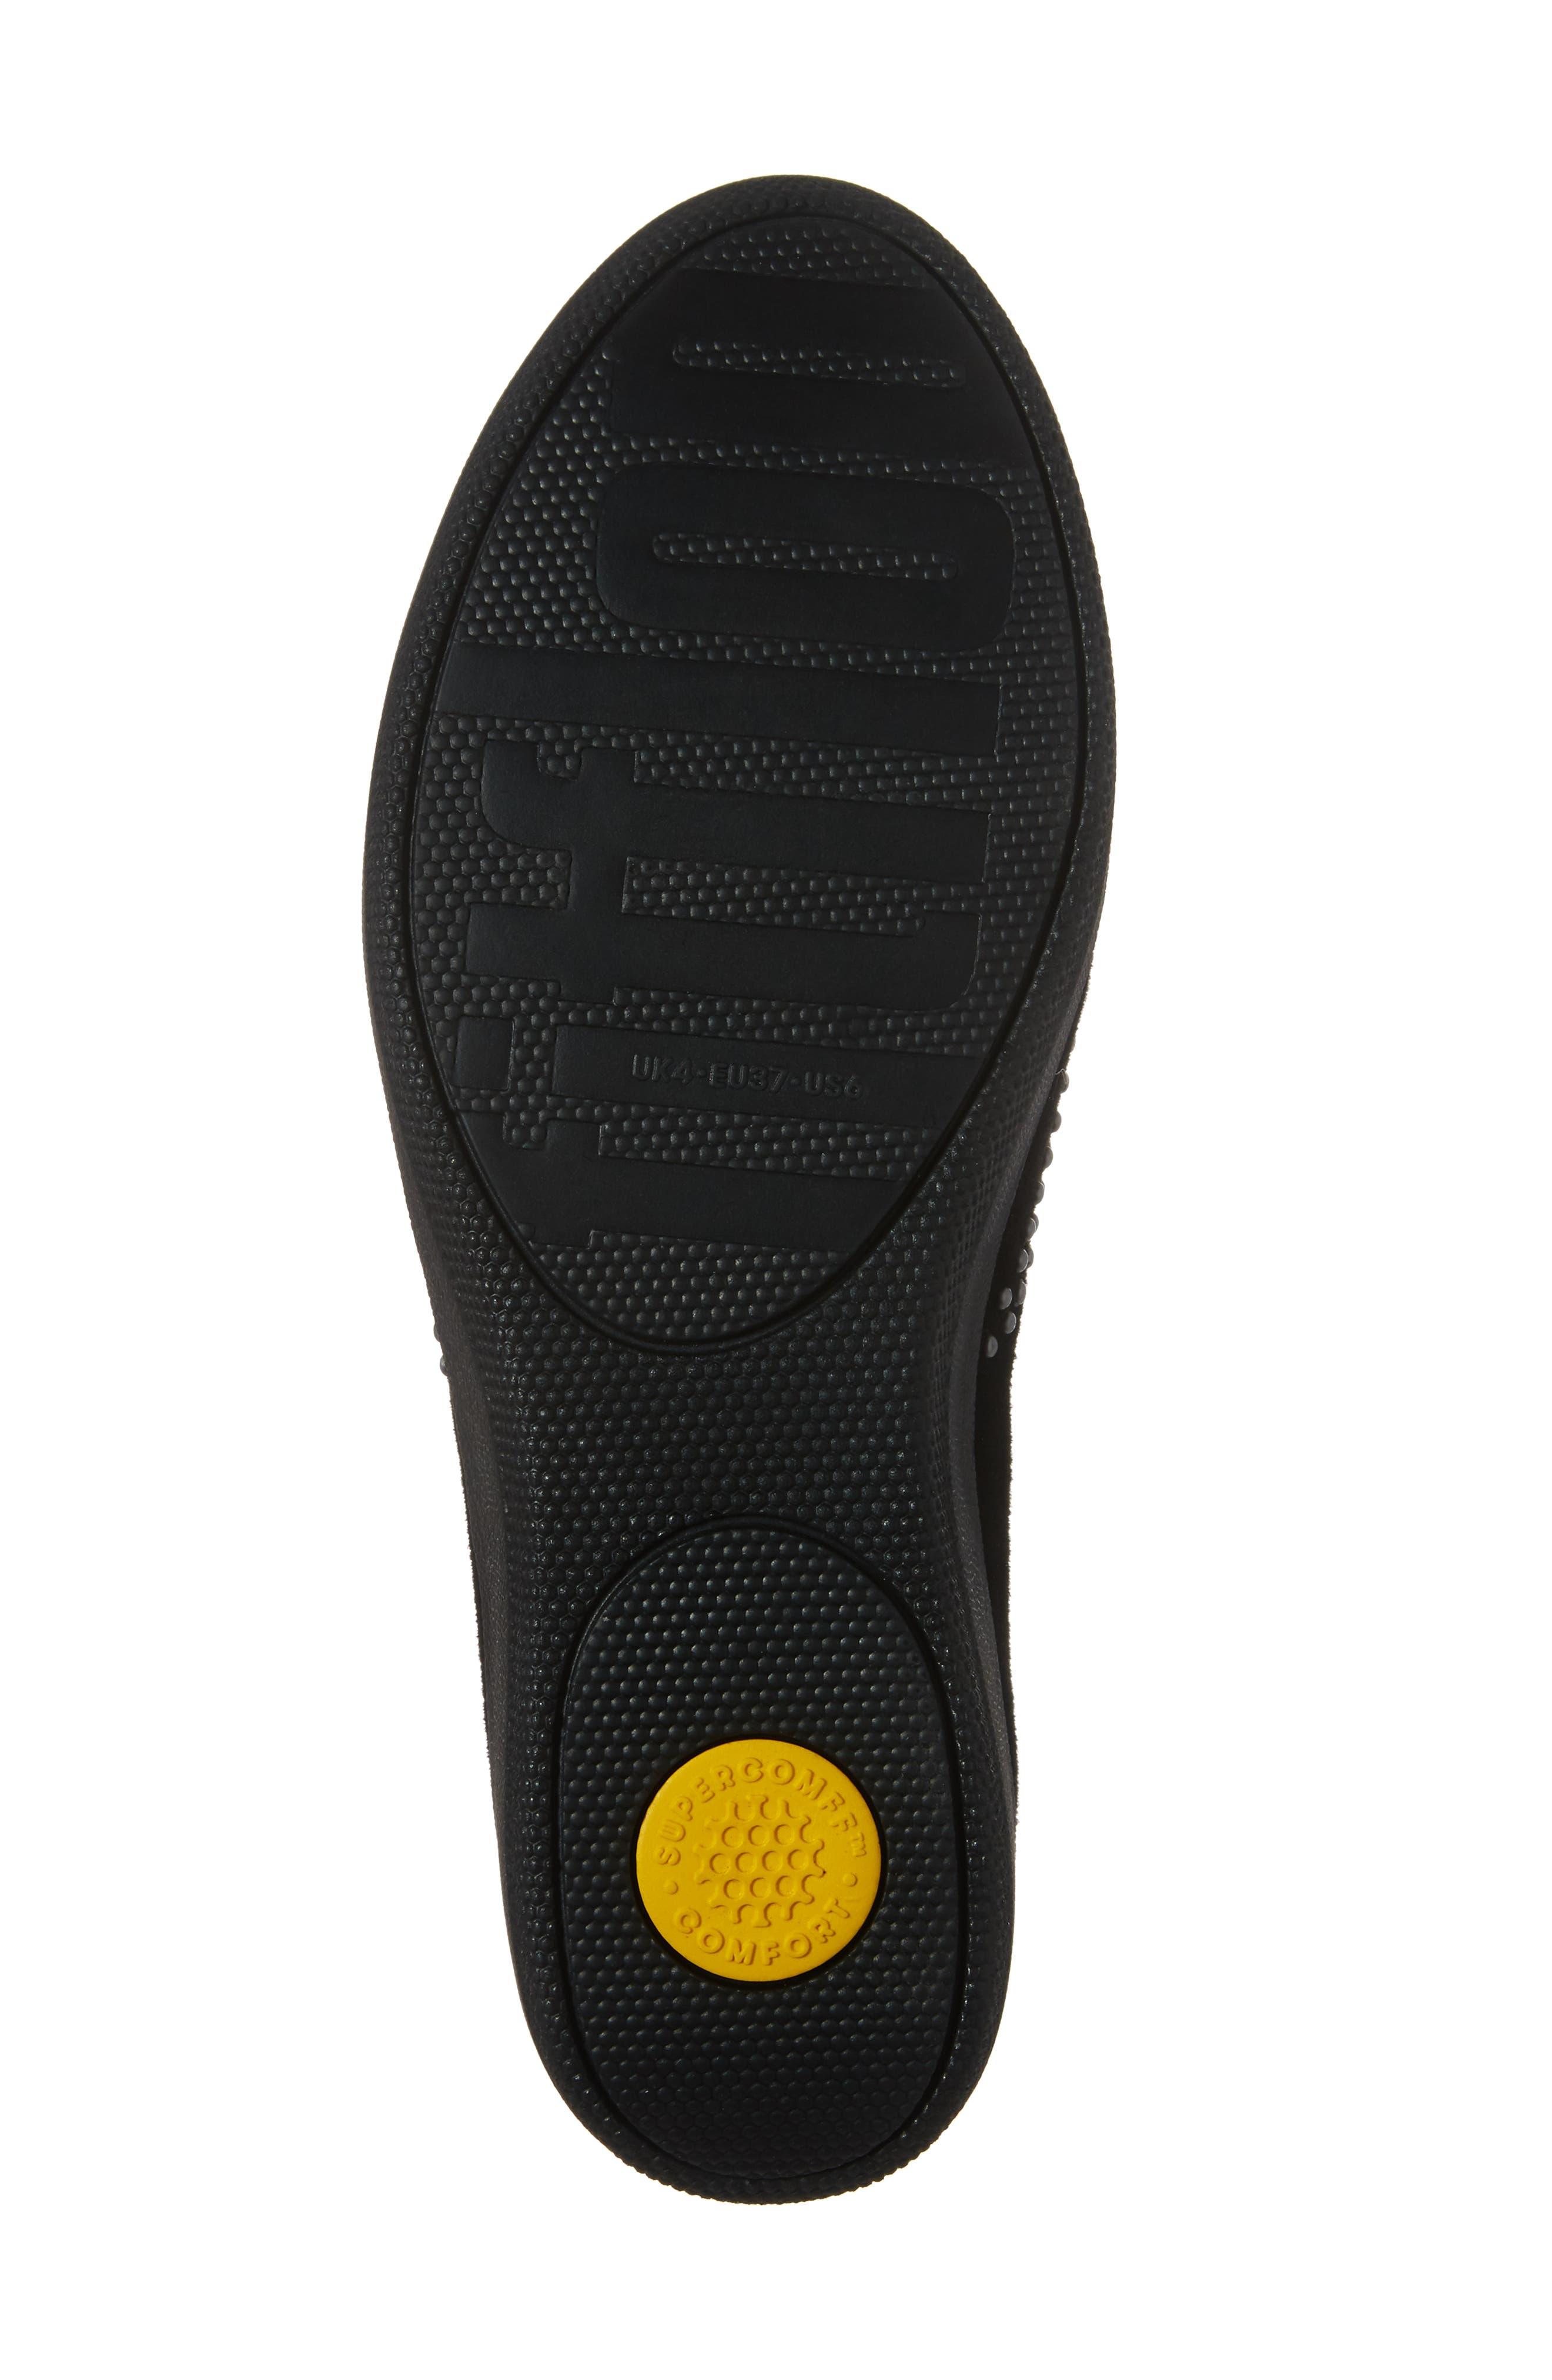 Superskate Studded Wedge Loafer,                             Alternate thumbnail 12, color,